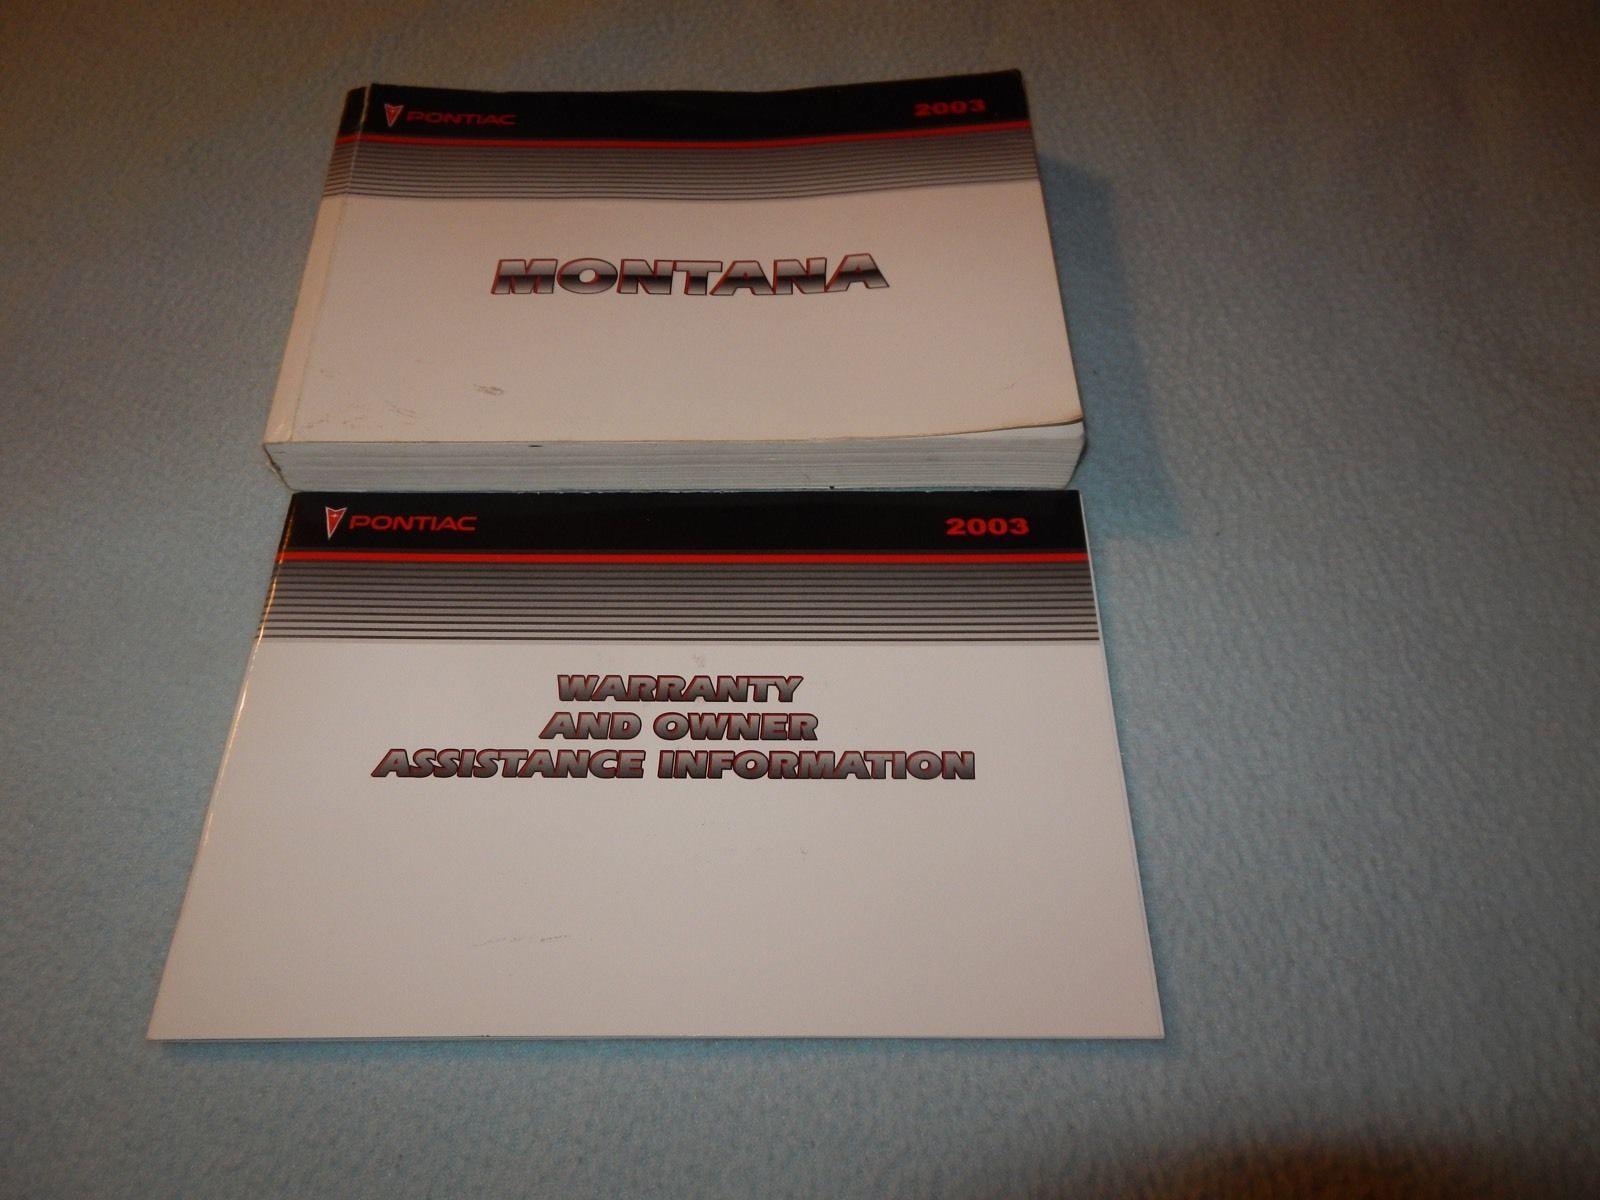 2003 pontiac montana owners manual with and similar items rh bonanza com 2004 pontiac montana repair manual 2004 Pontiac Montana Interior